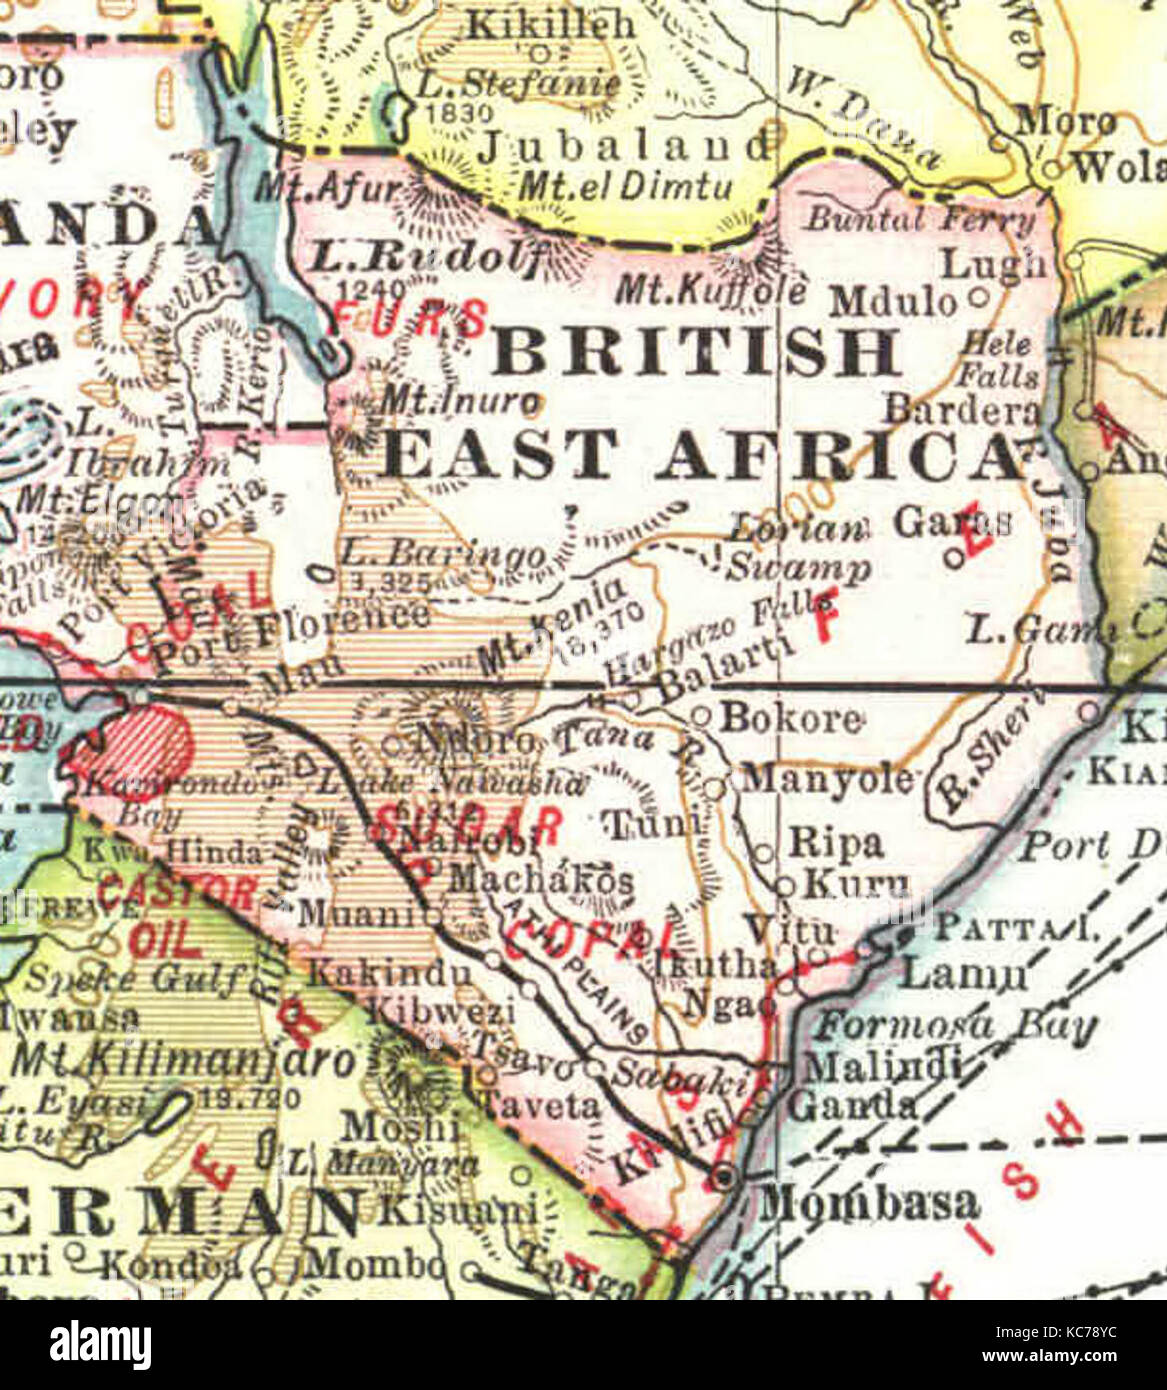 British East Africa In Stock Photo